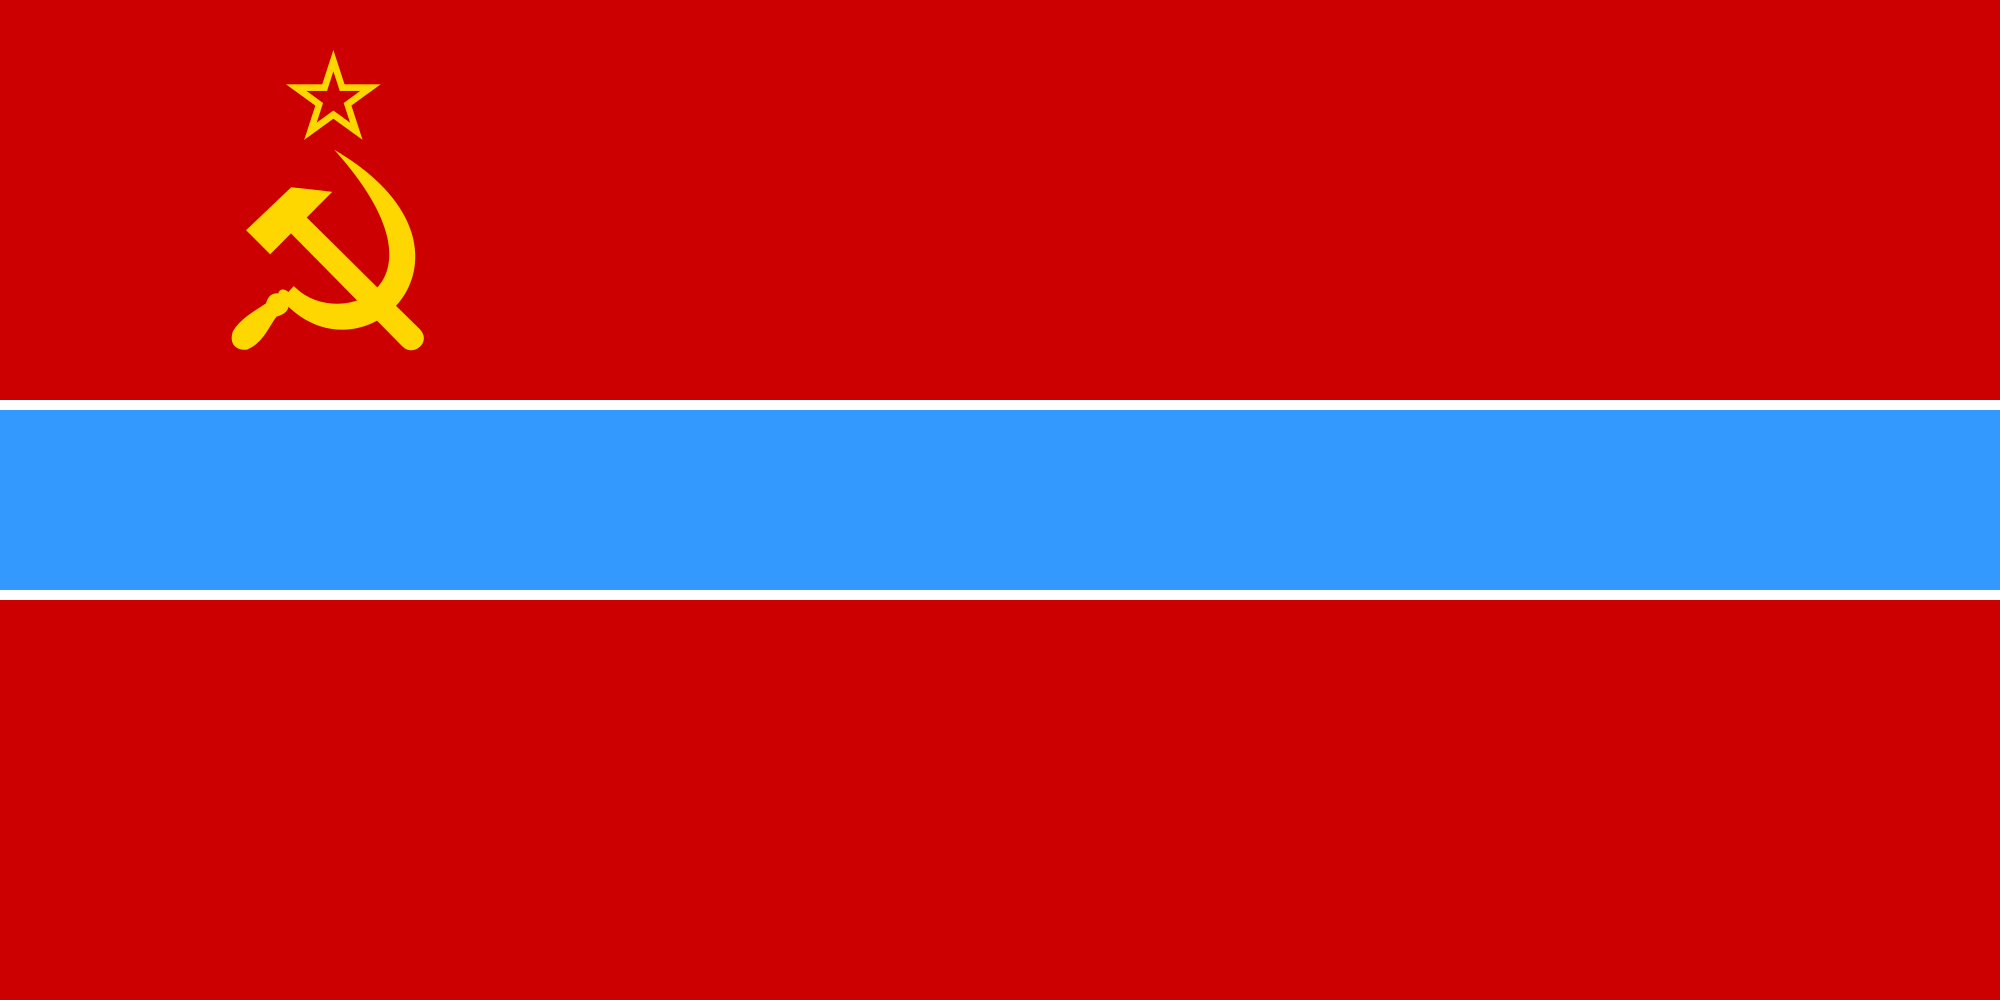 Soviet Union CCCP images Uzbekistan SSR Flag HD wallpaper and 2000x1000